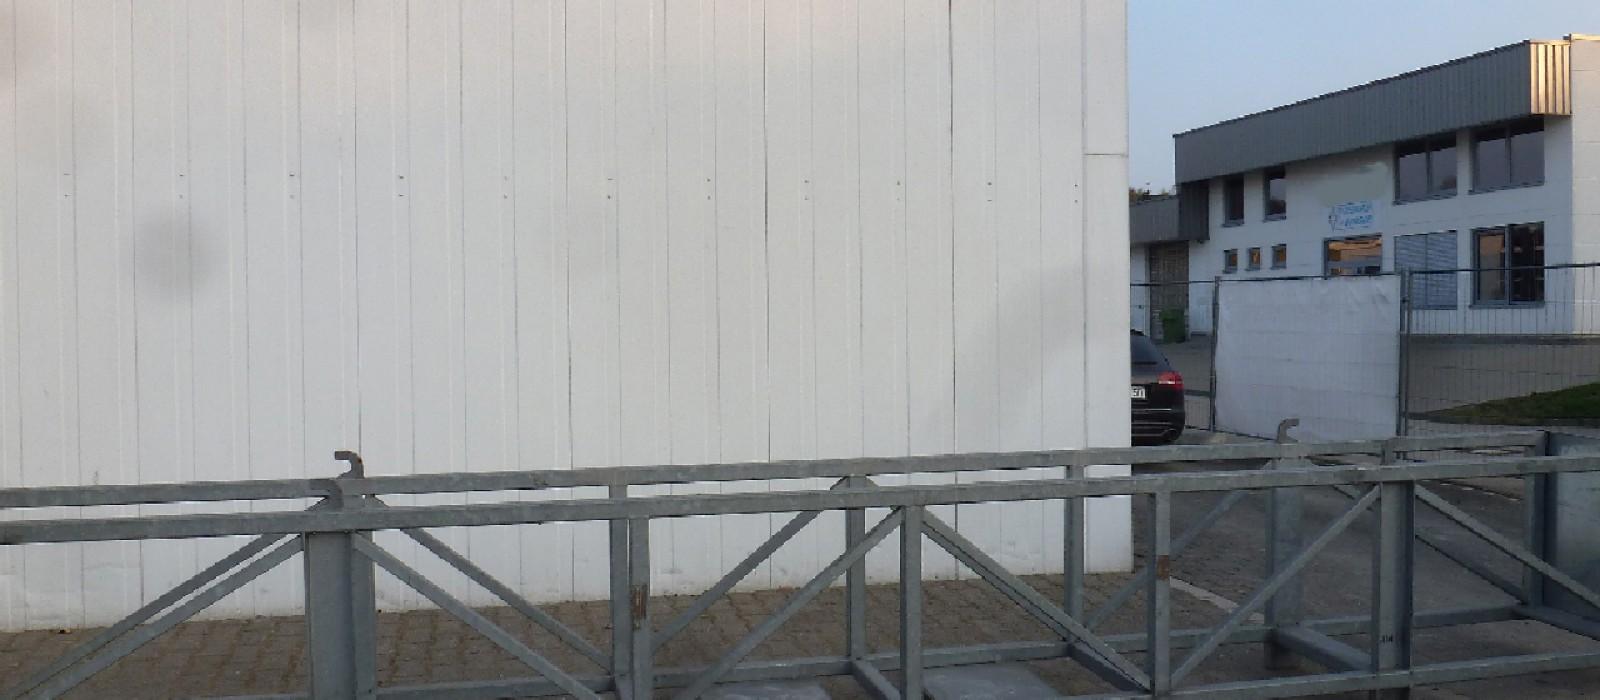 2–Langguttransportpalette-6000x700x700-mm